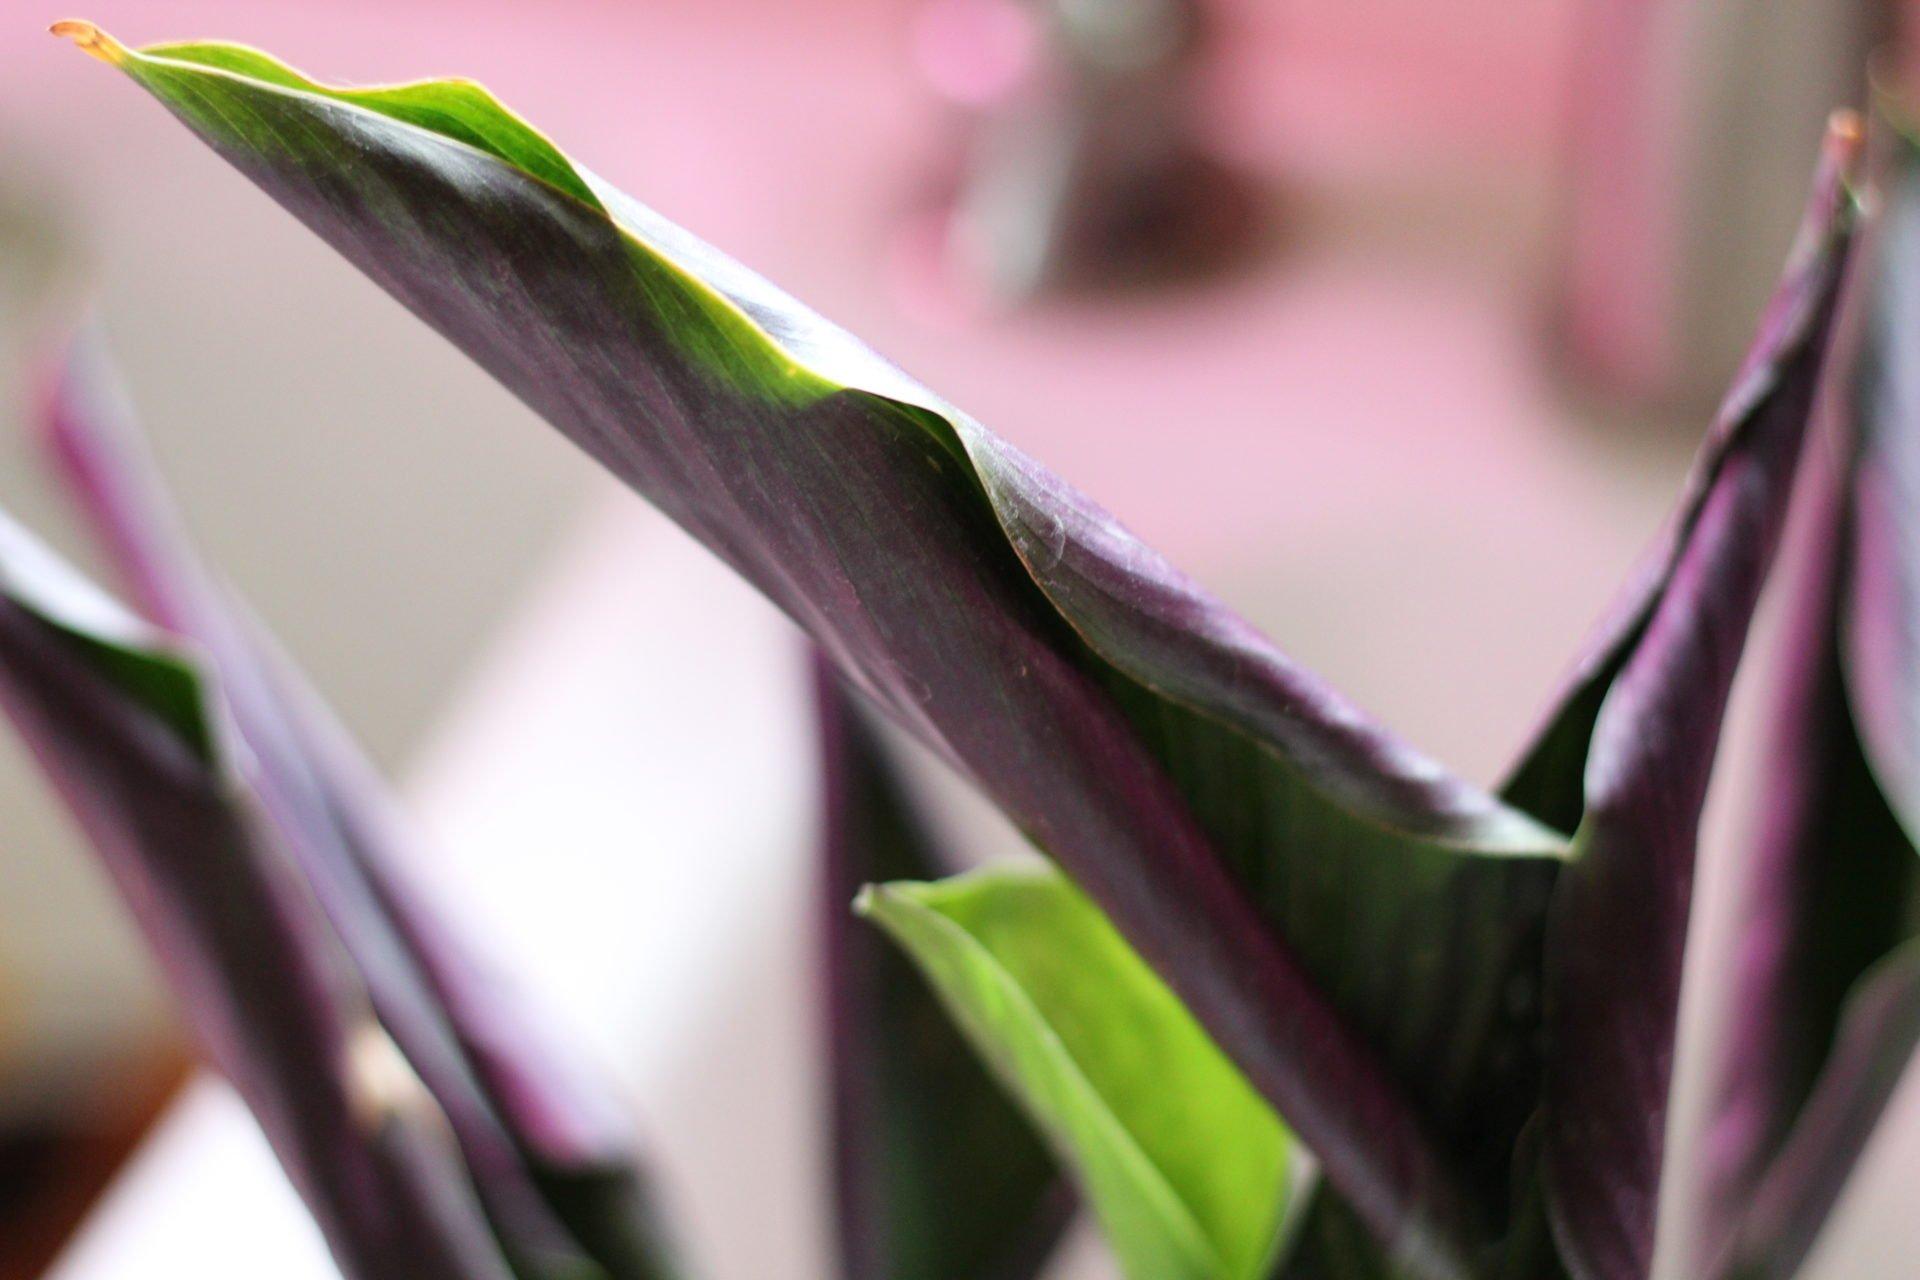 dry calathea leaves